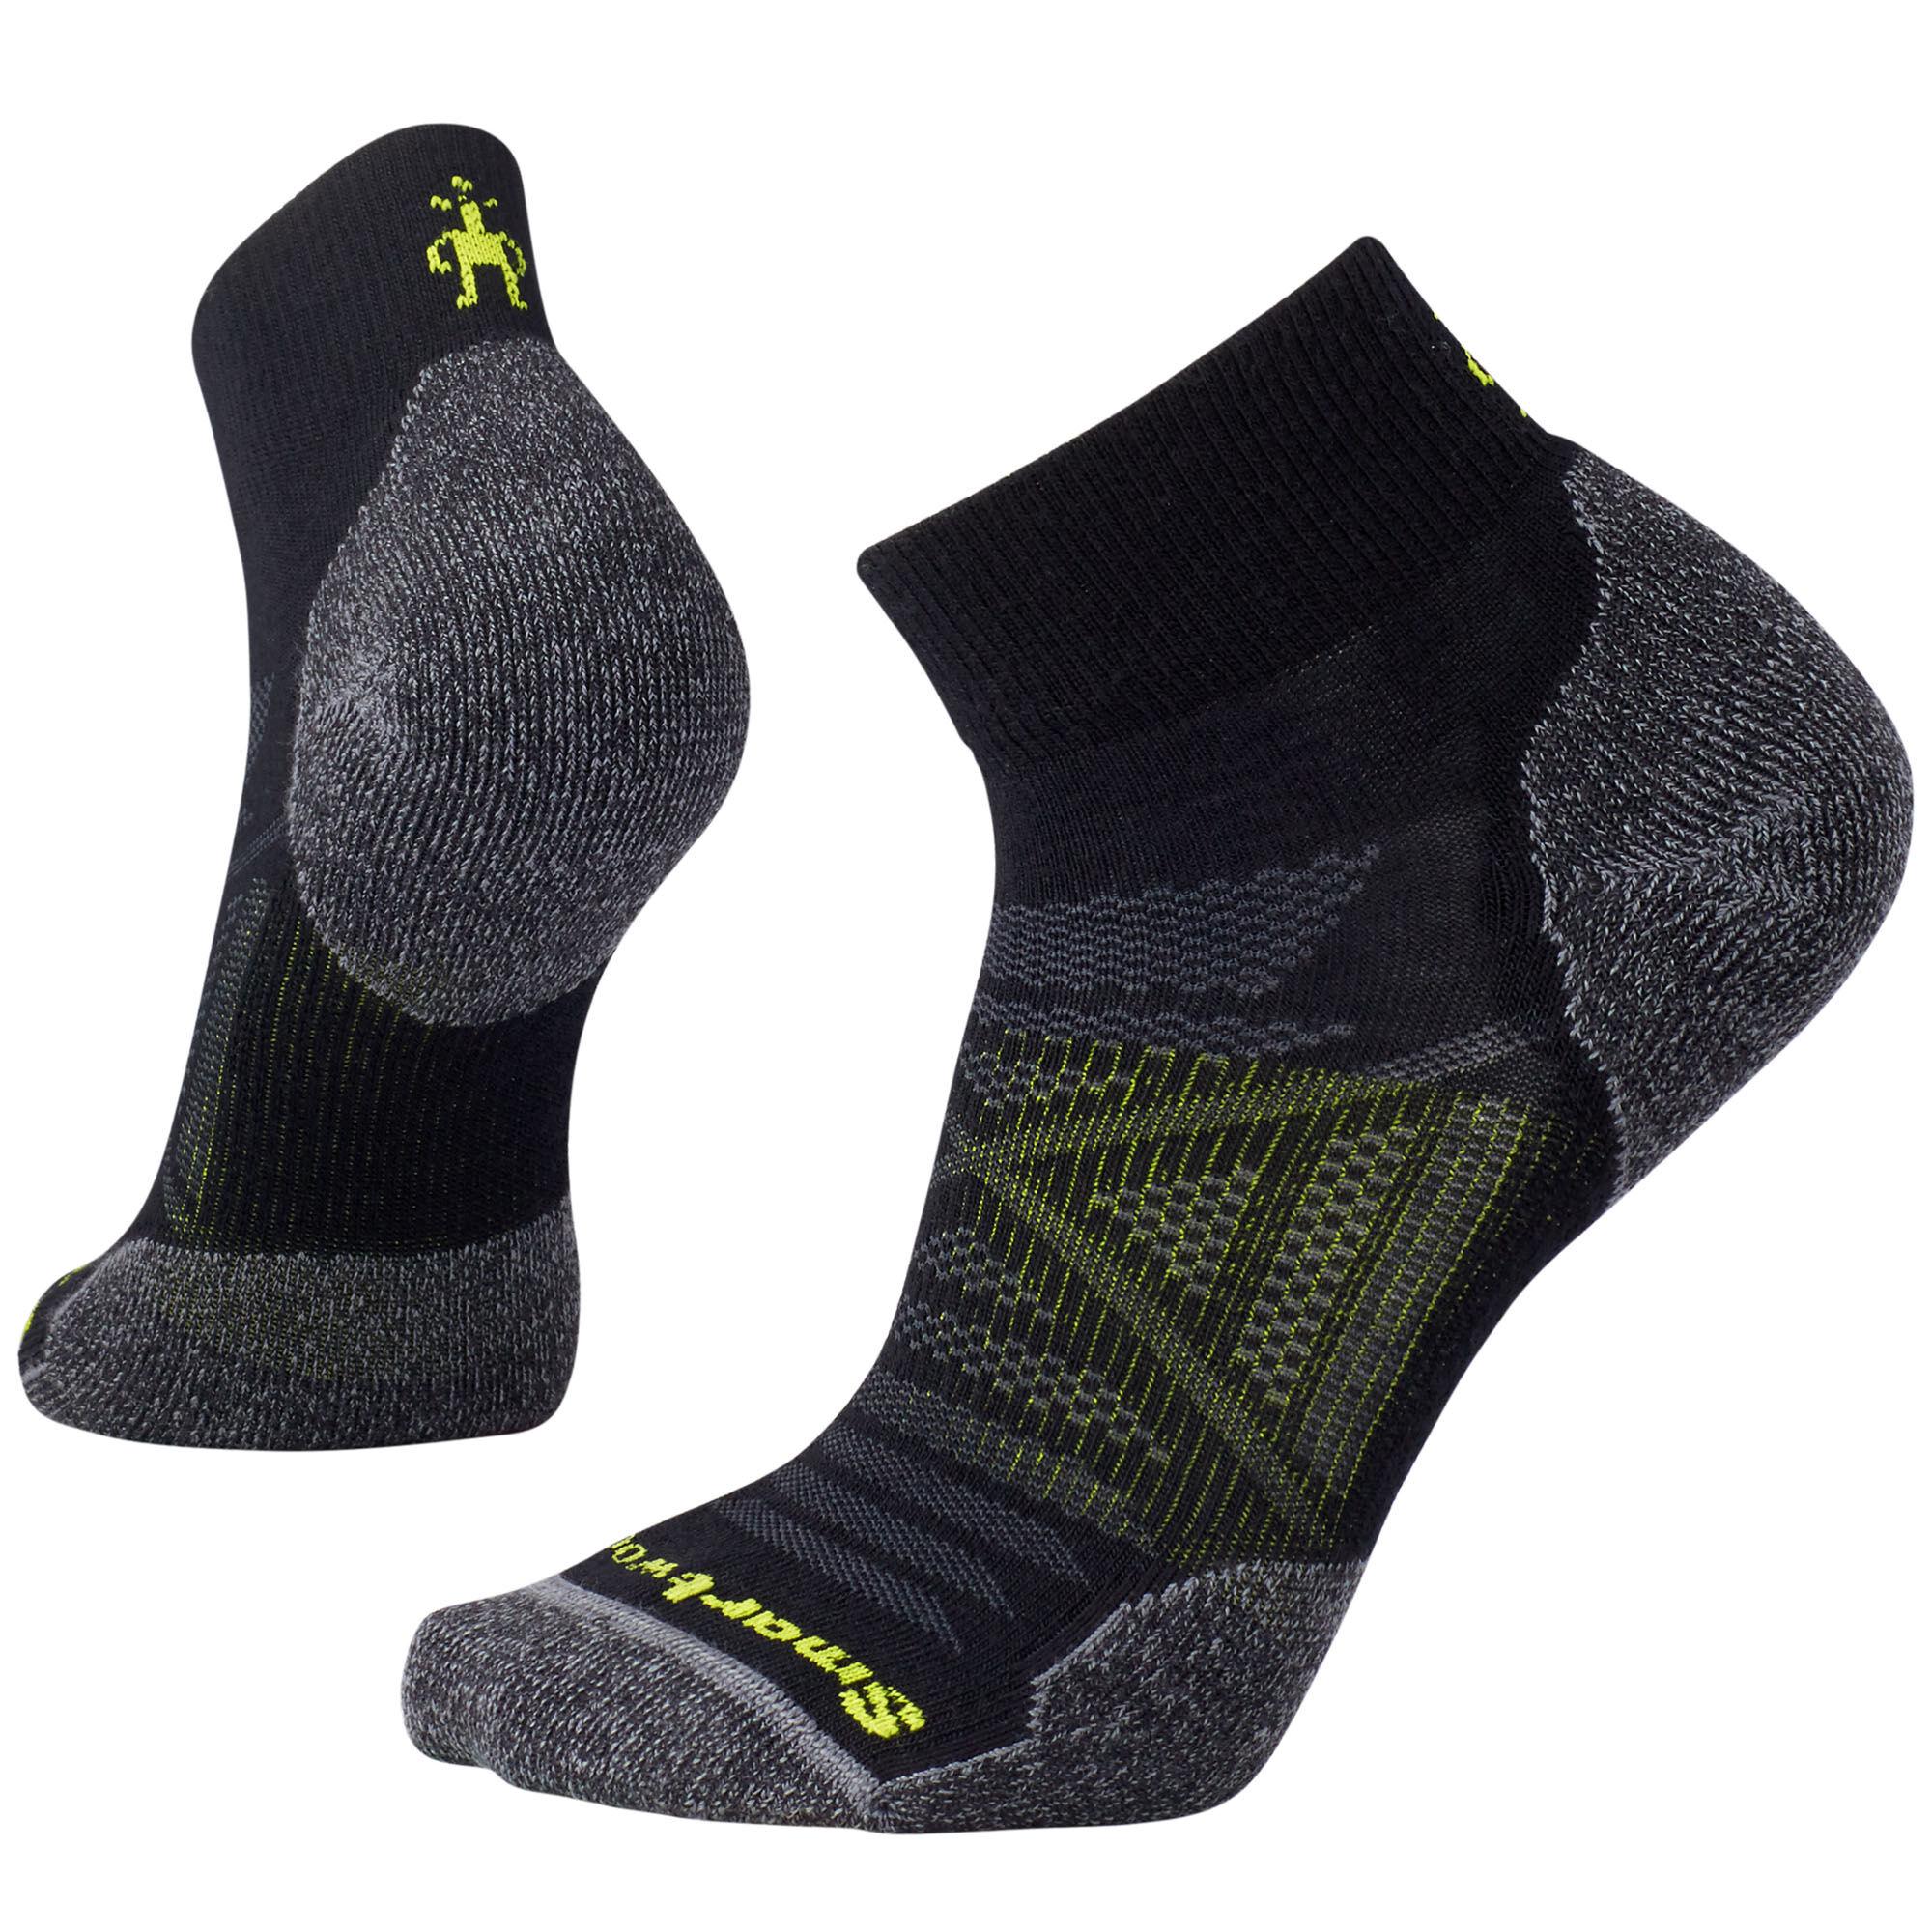 Thorlo Mens Green Ultra Light Hiker Crew Outdoors Sports Walking Hiking Socks